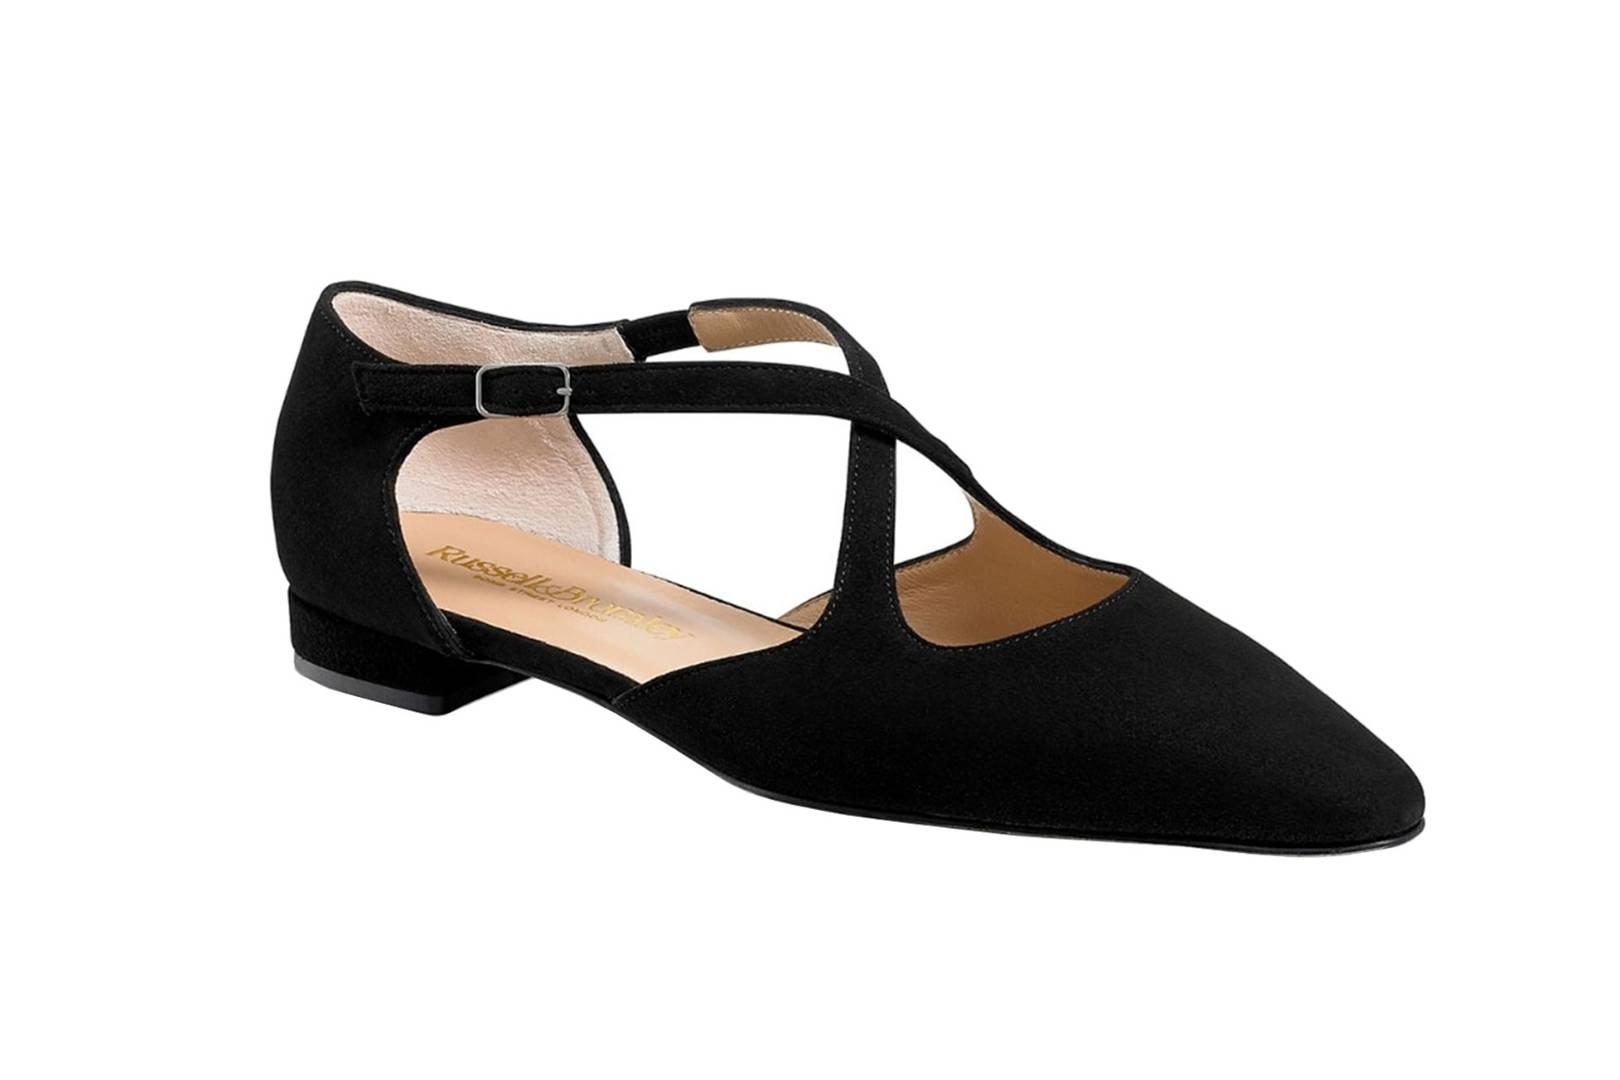 b9fb69fcc7d Best Flat Shoes  The Best Loafers